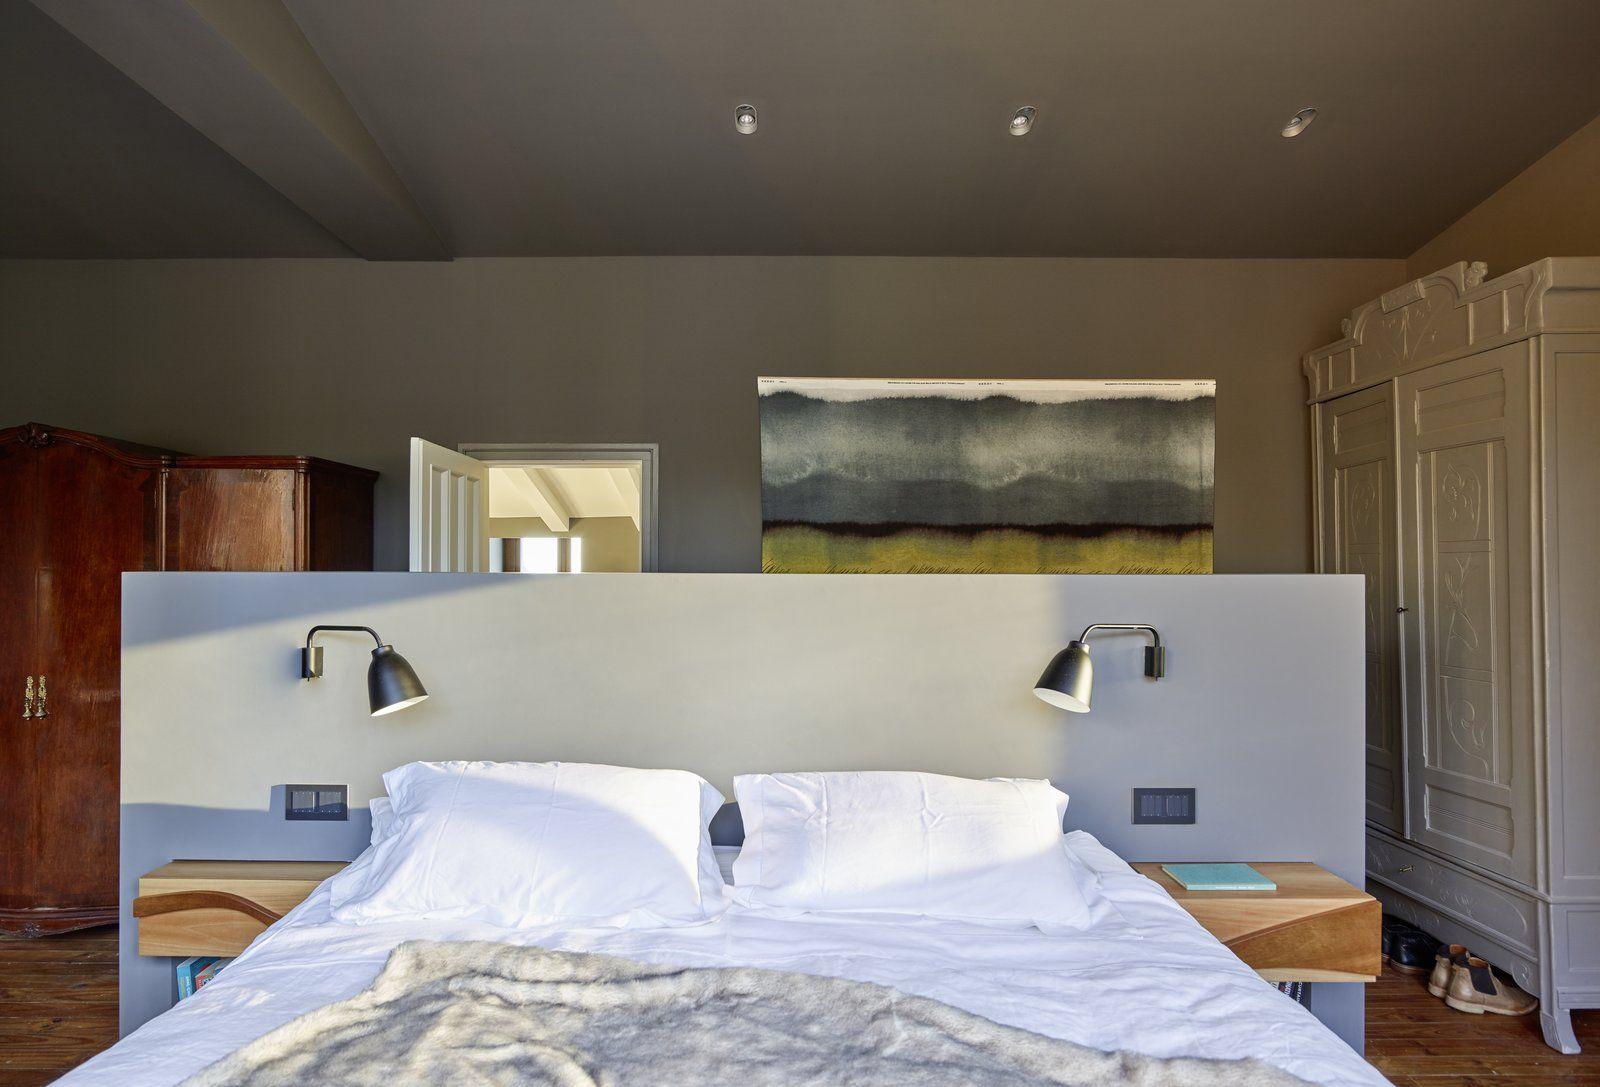 Modern home with bedroom medium hardwood floor dresser wardrobe